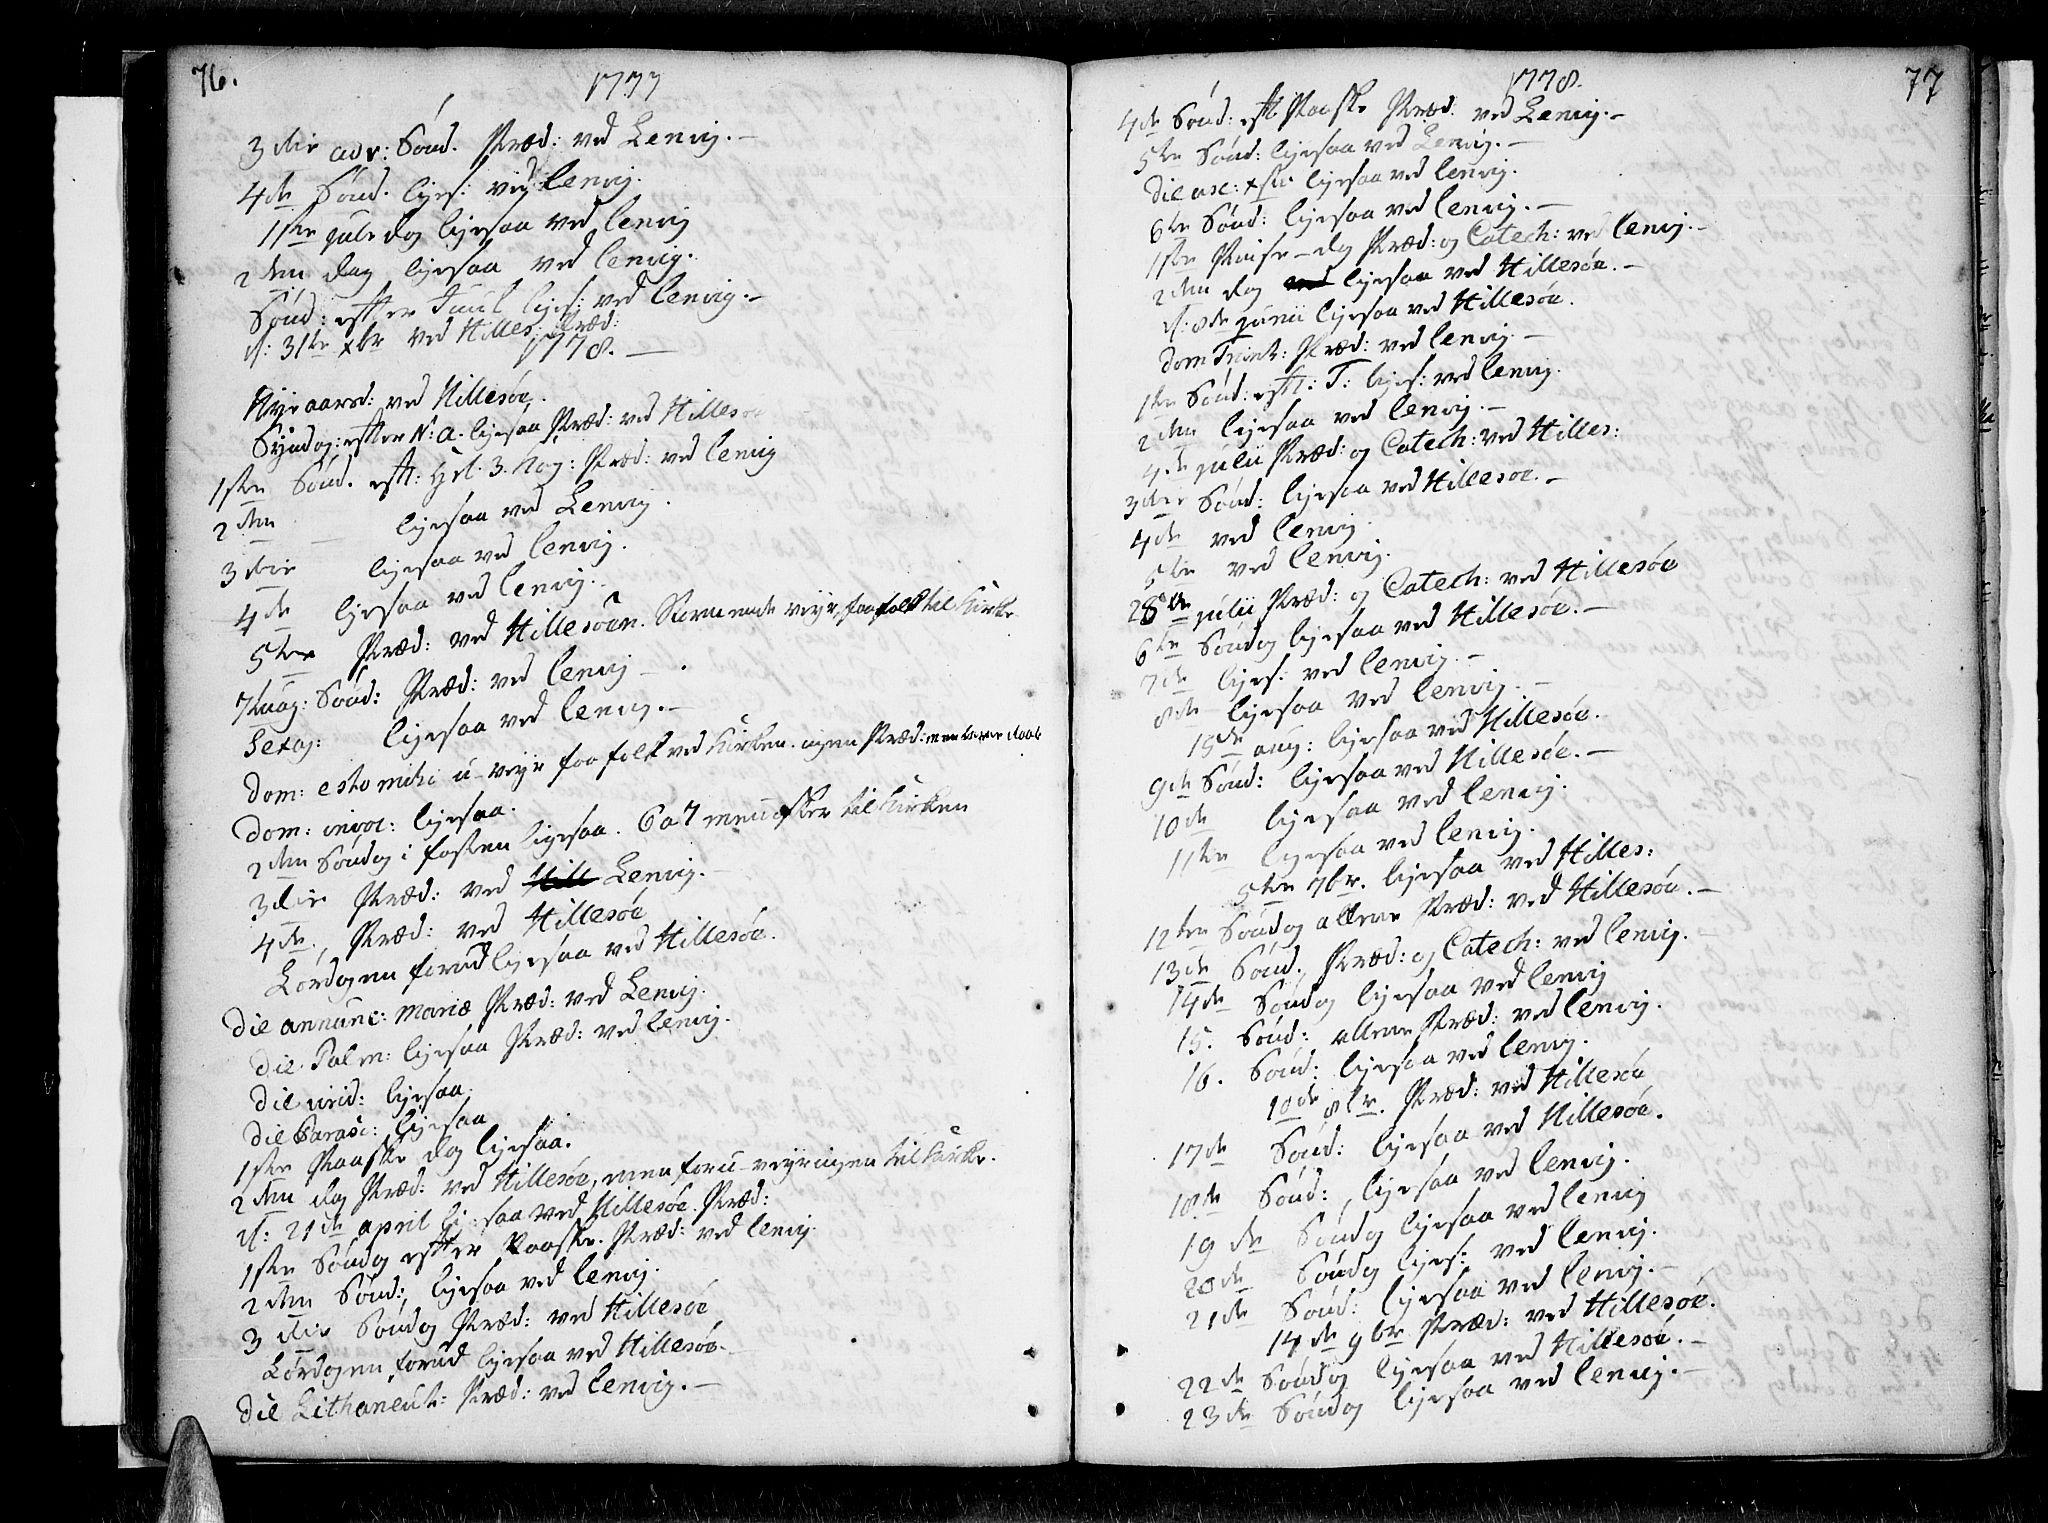 SATØ, Lenvik sokneprestembete, H/Ha: Ministerialbok nr. 1, 1753-1783, s. 76-77